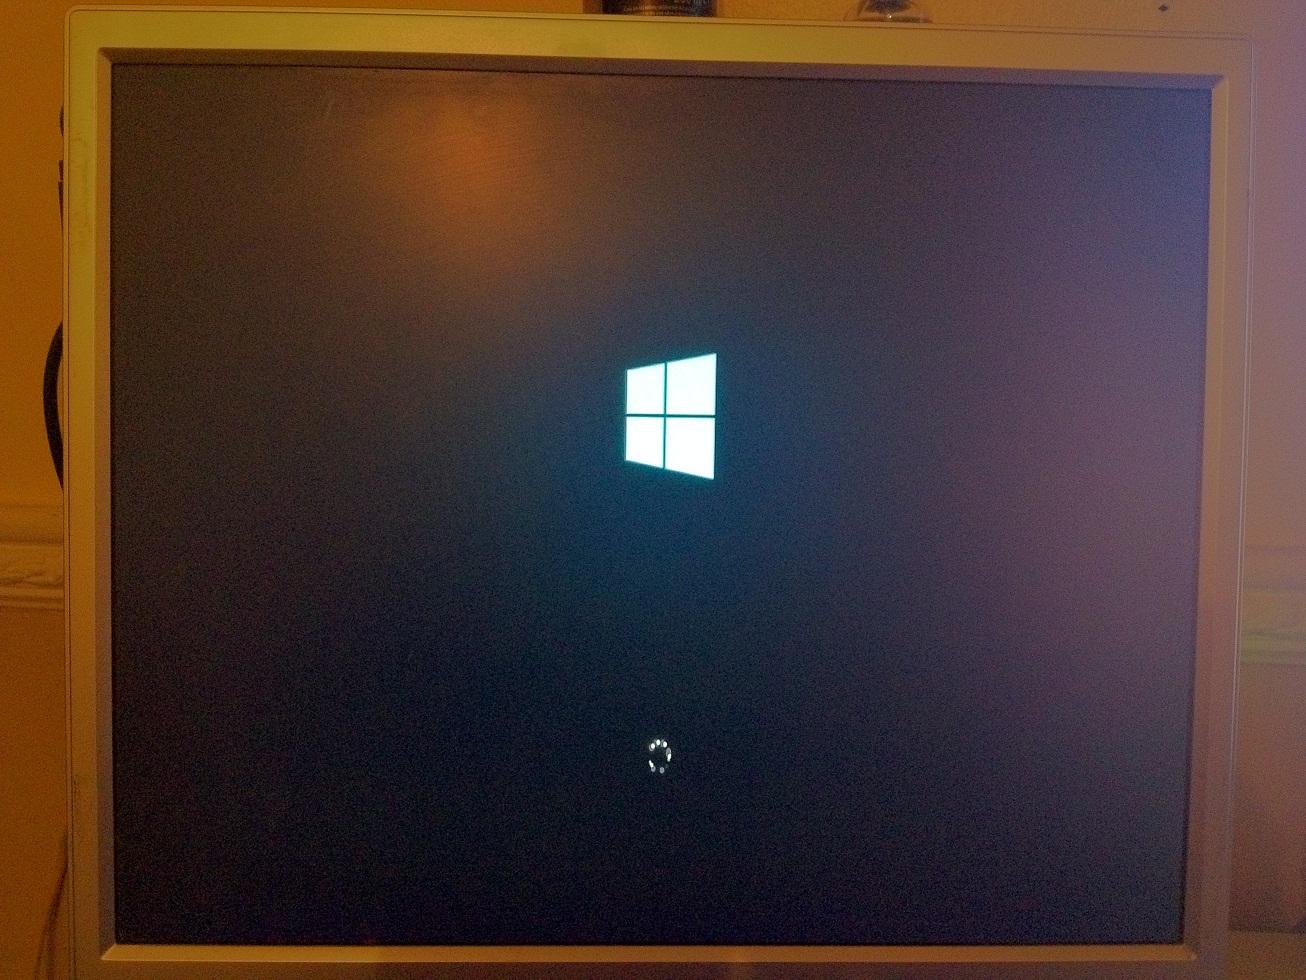 Nforce 780i SLI Boot OS error - EVGA Forums